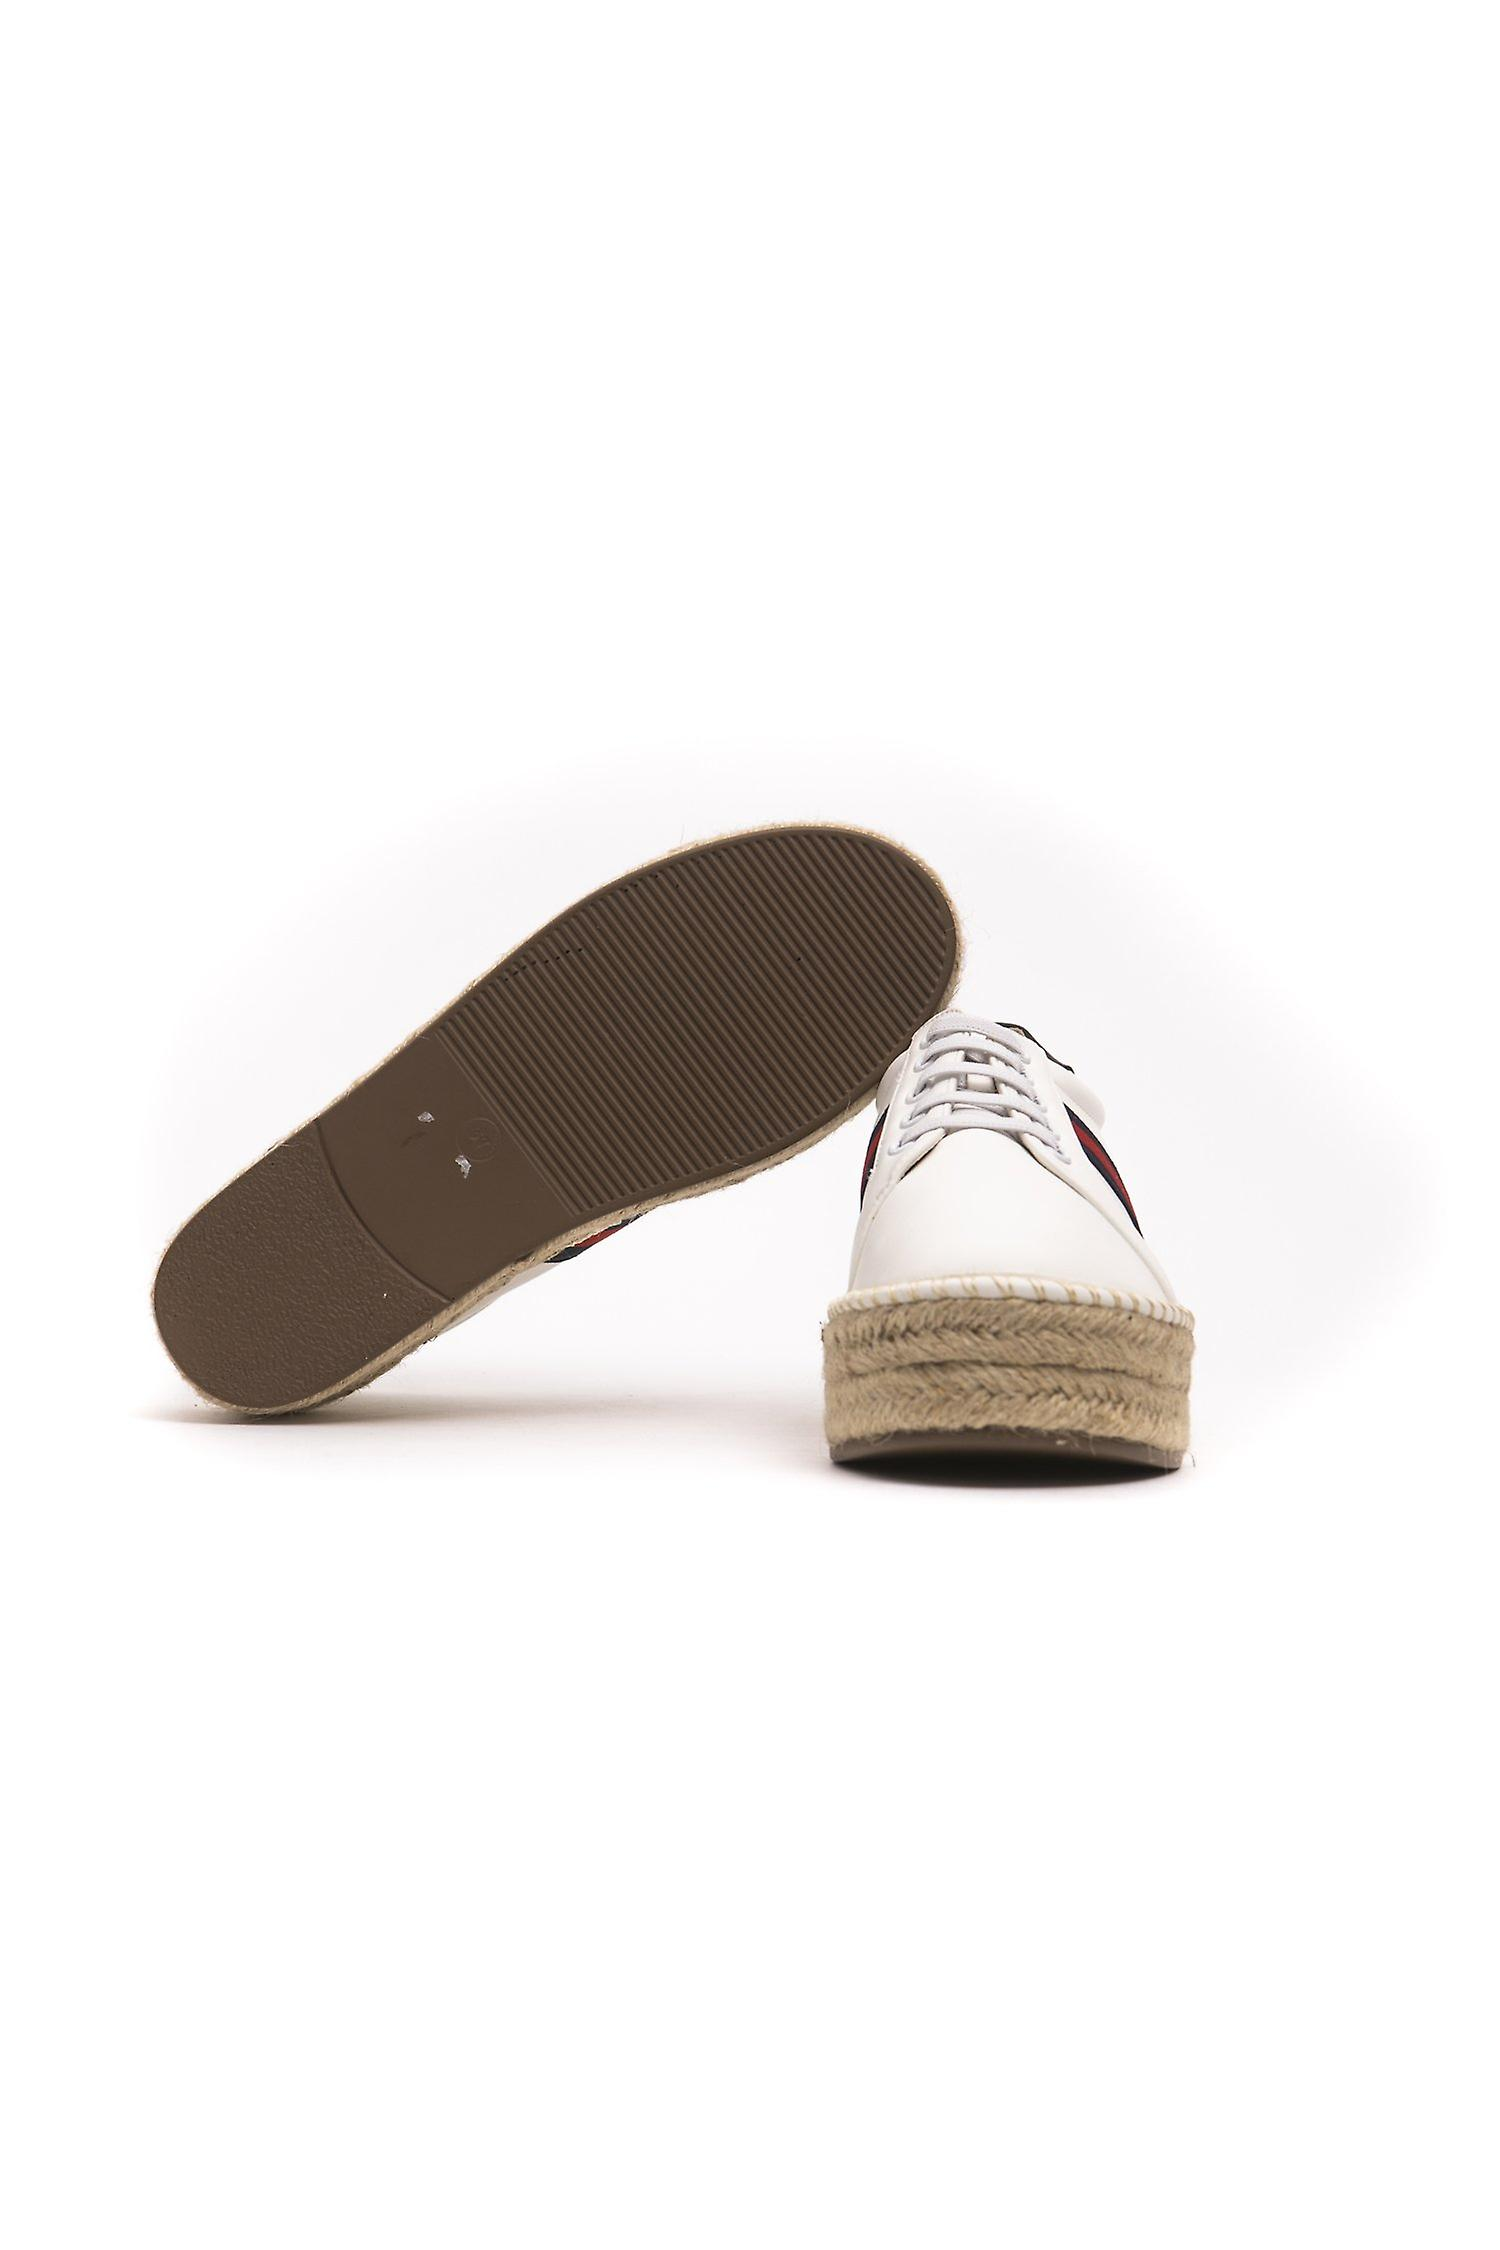 White Navy Sneakers GR998784-EU36-US5-5